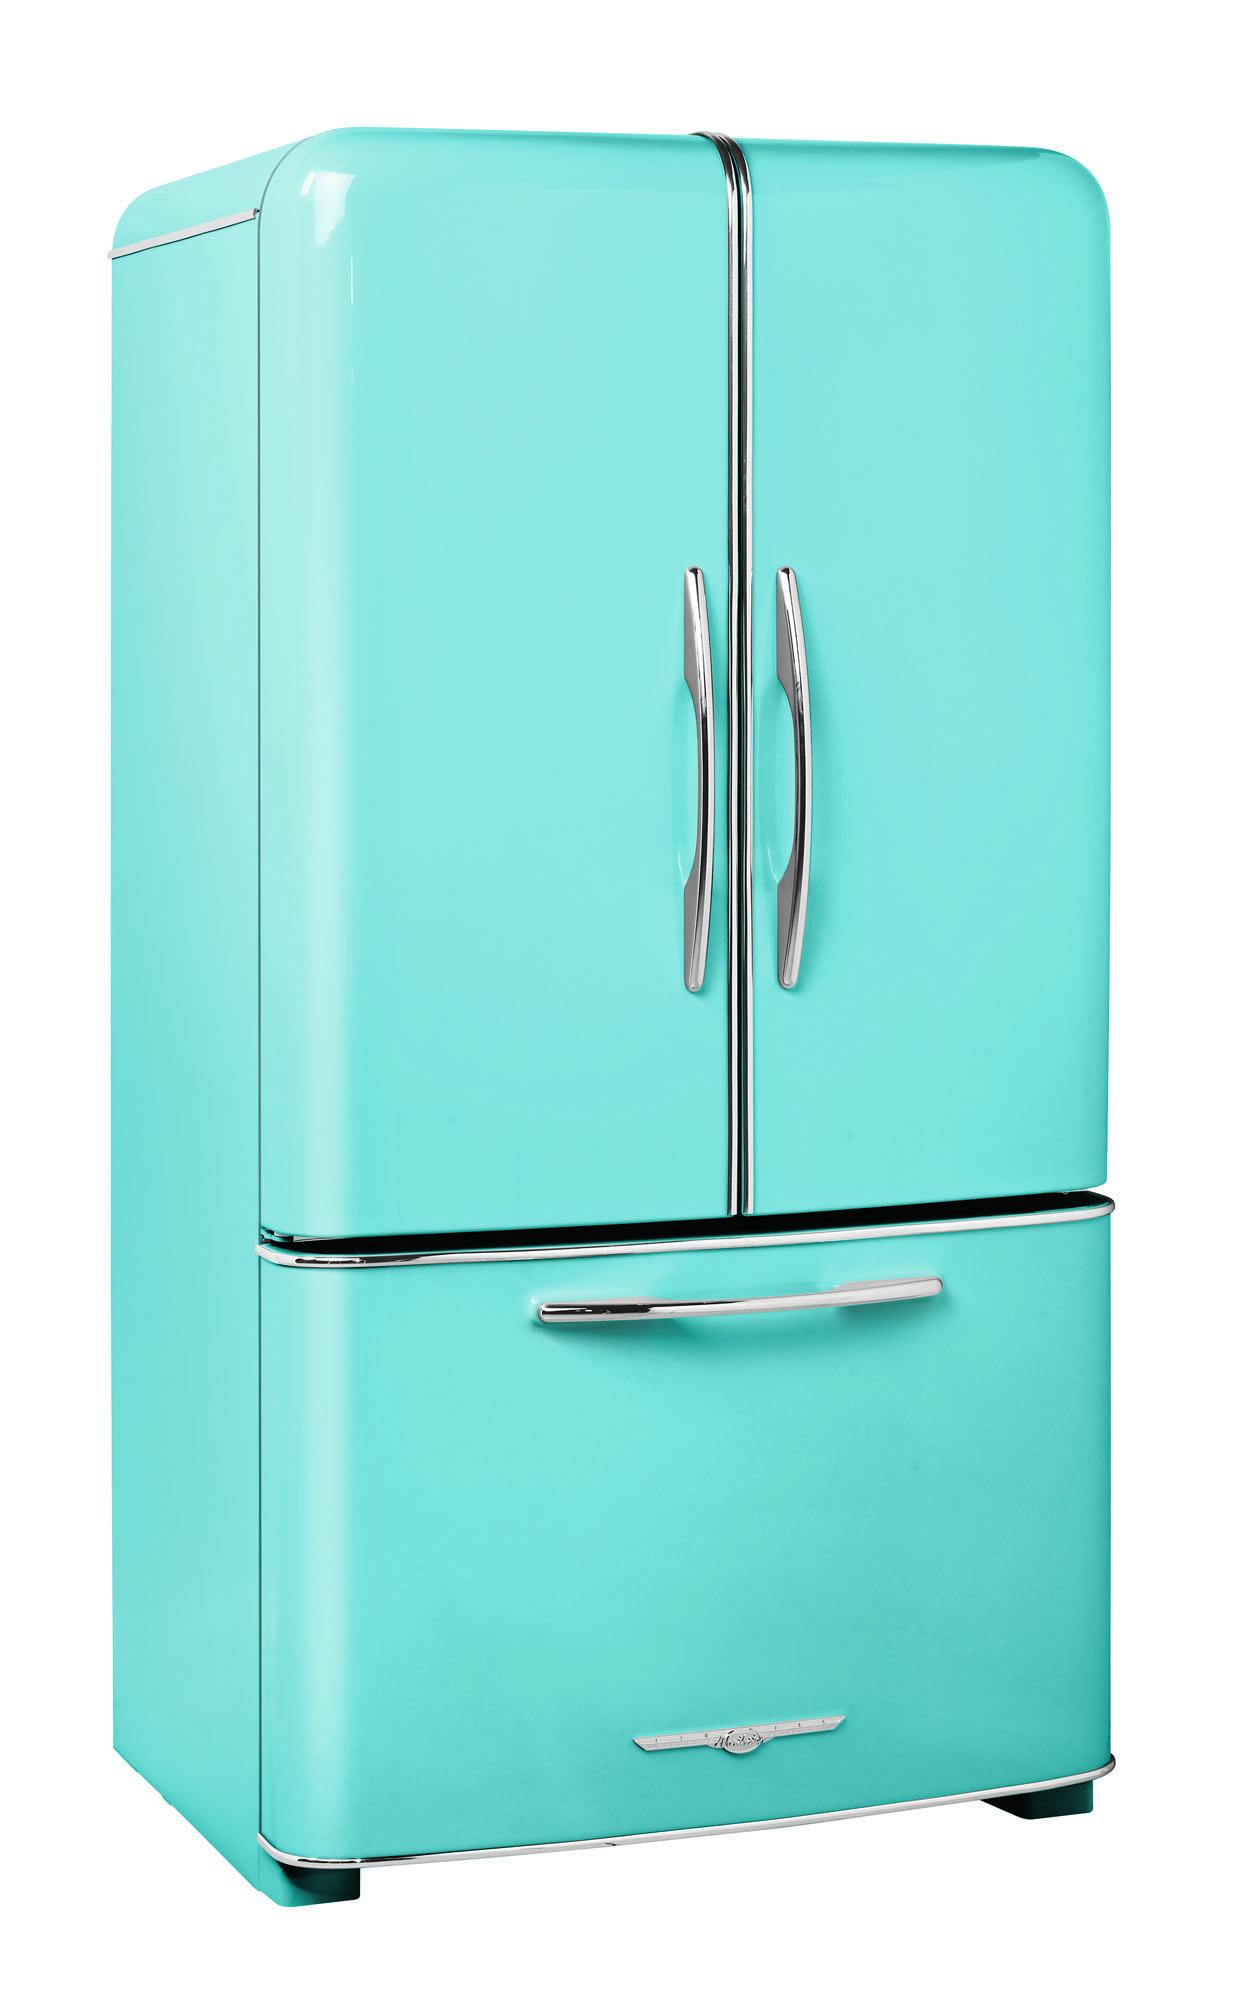 1959 Northstar cabinet-depth fridge